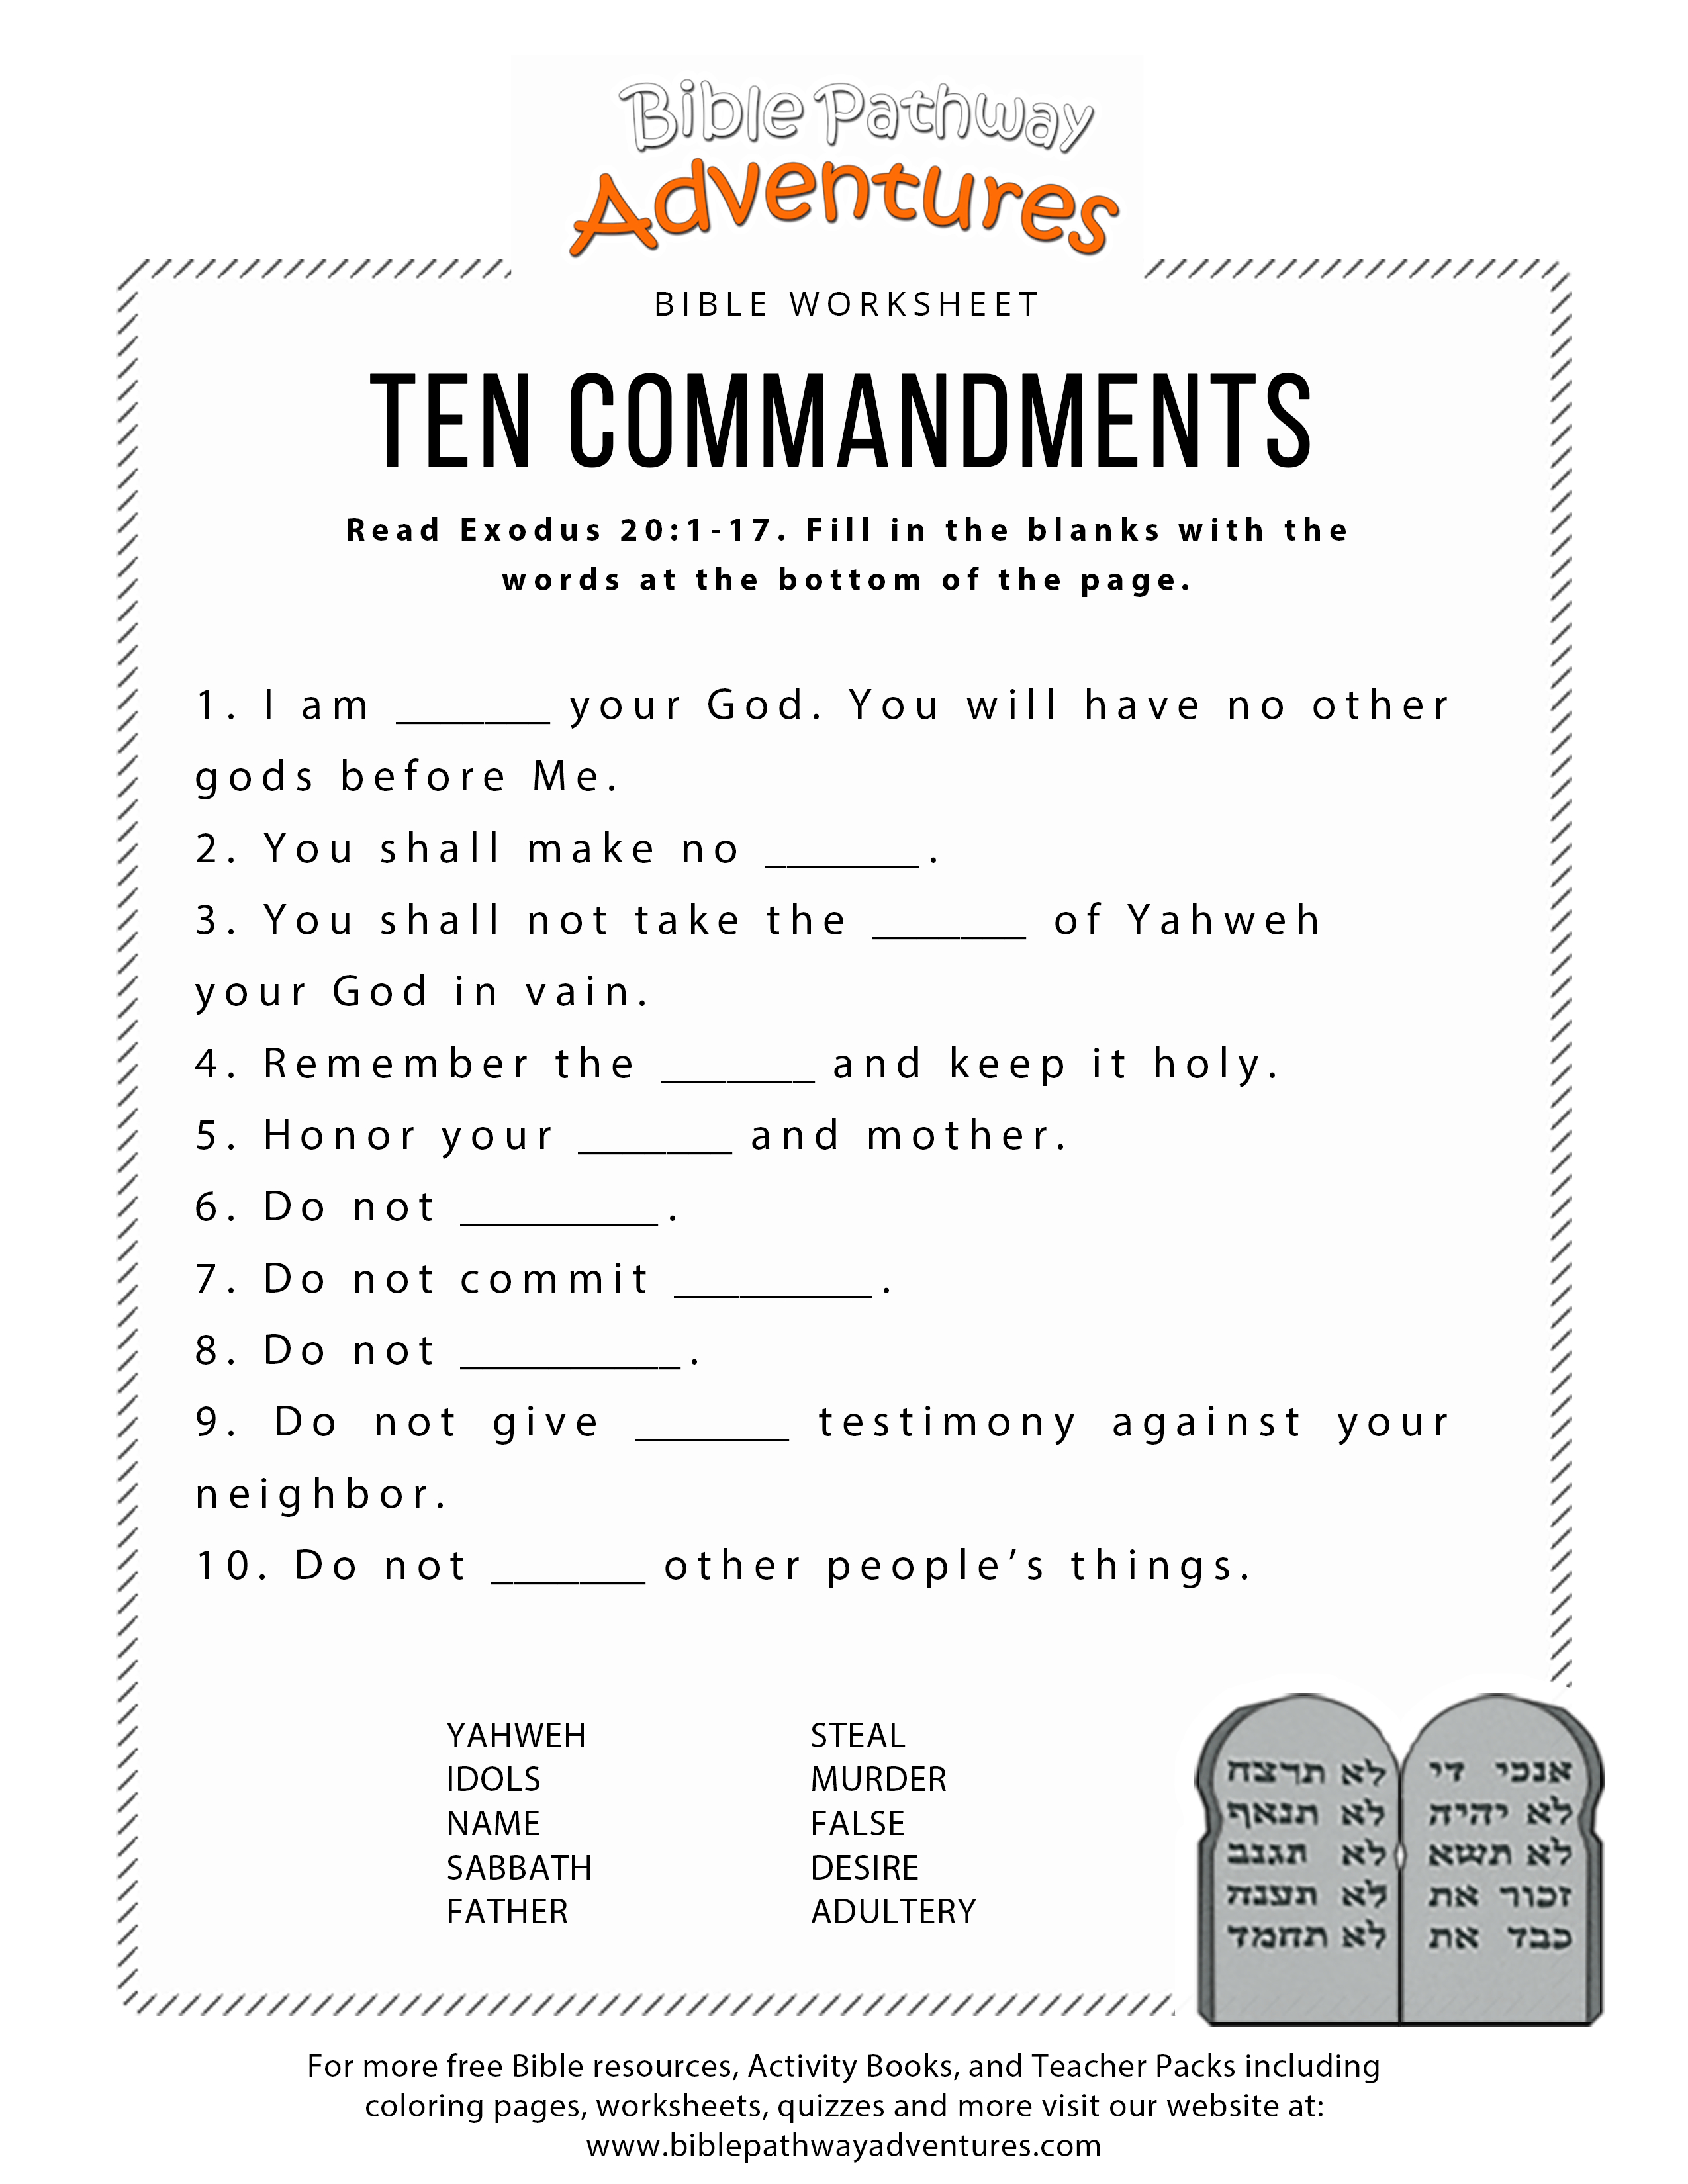 Ten Commandments Worksheet For Kids | Worksheets For Psr | Bible - Free Printable Children's Bible Lessons